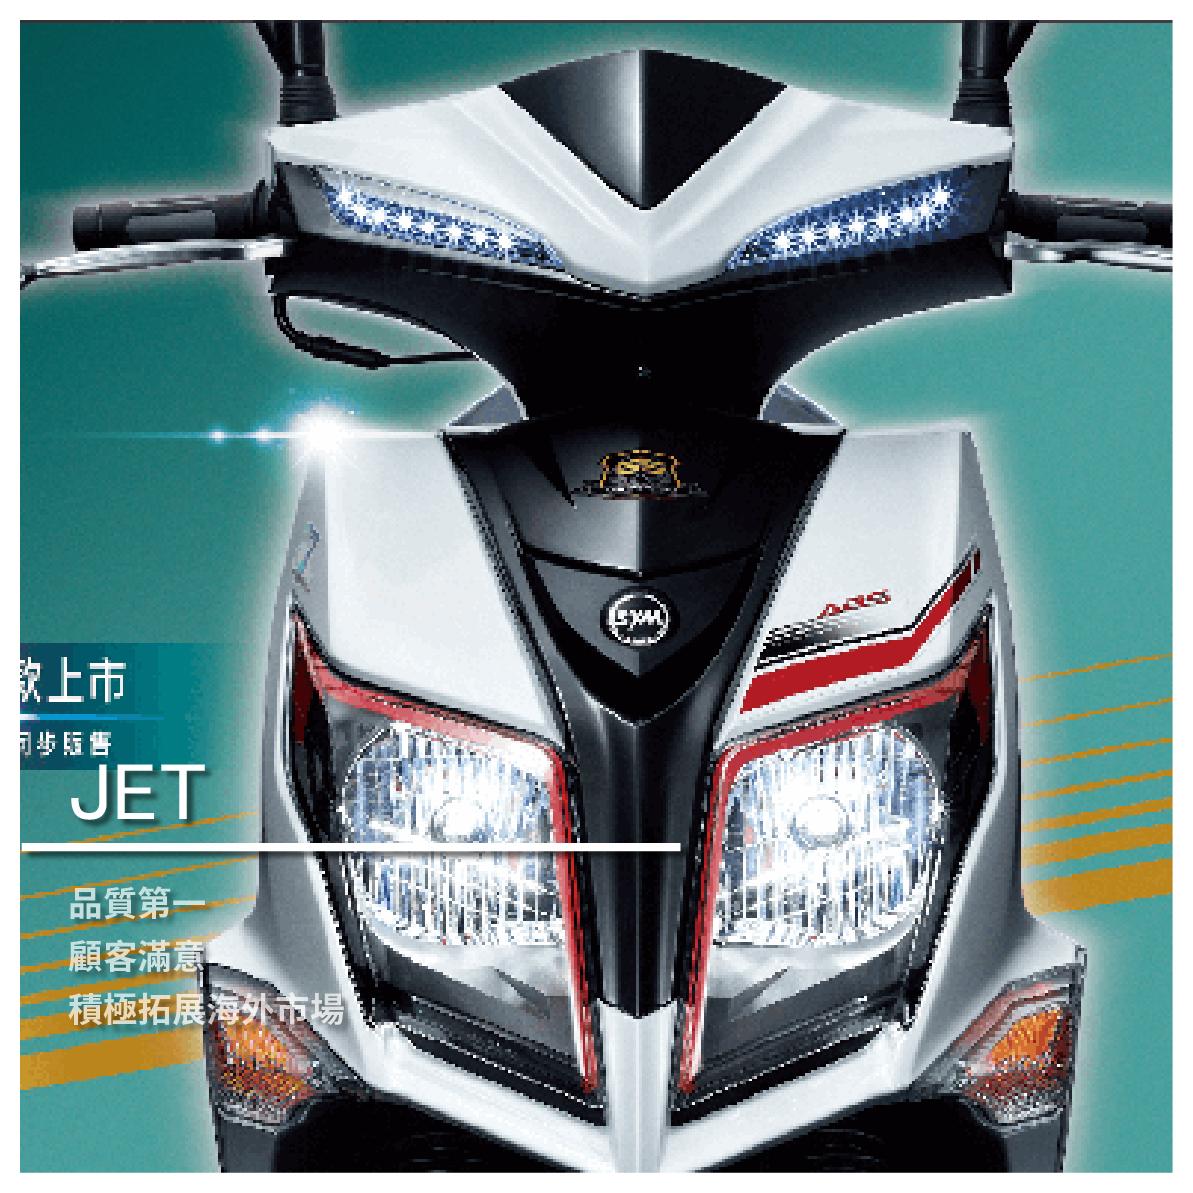 【鋐安車業】SYM 三陽系列 JET